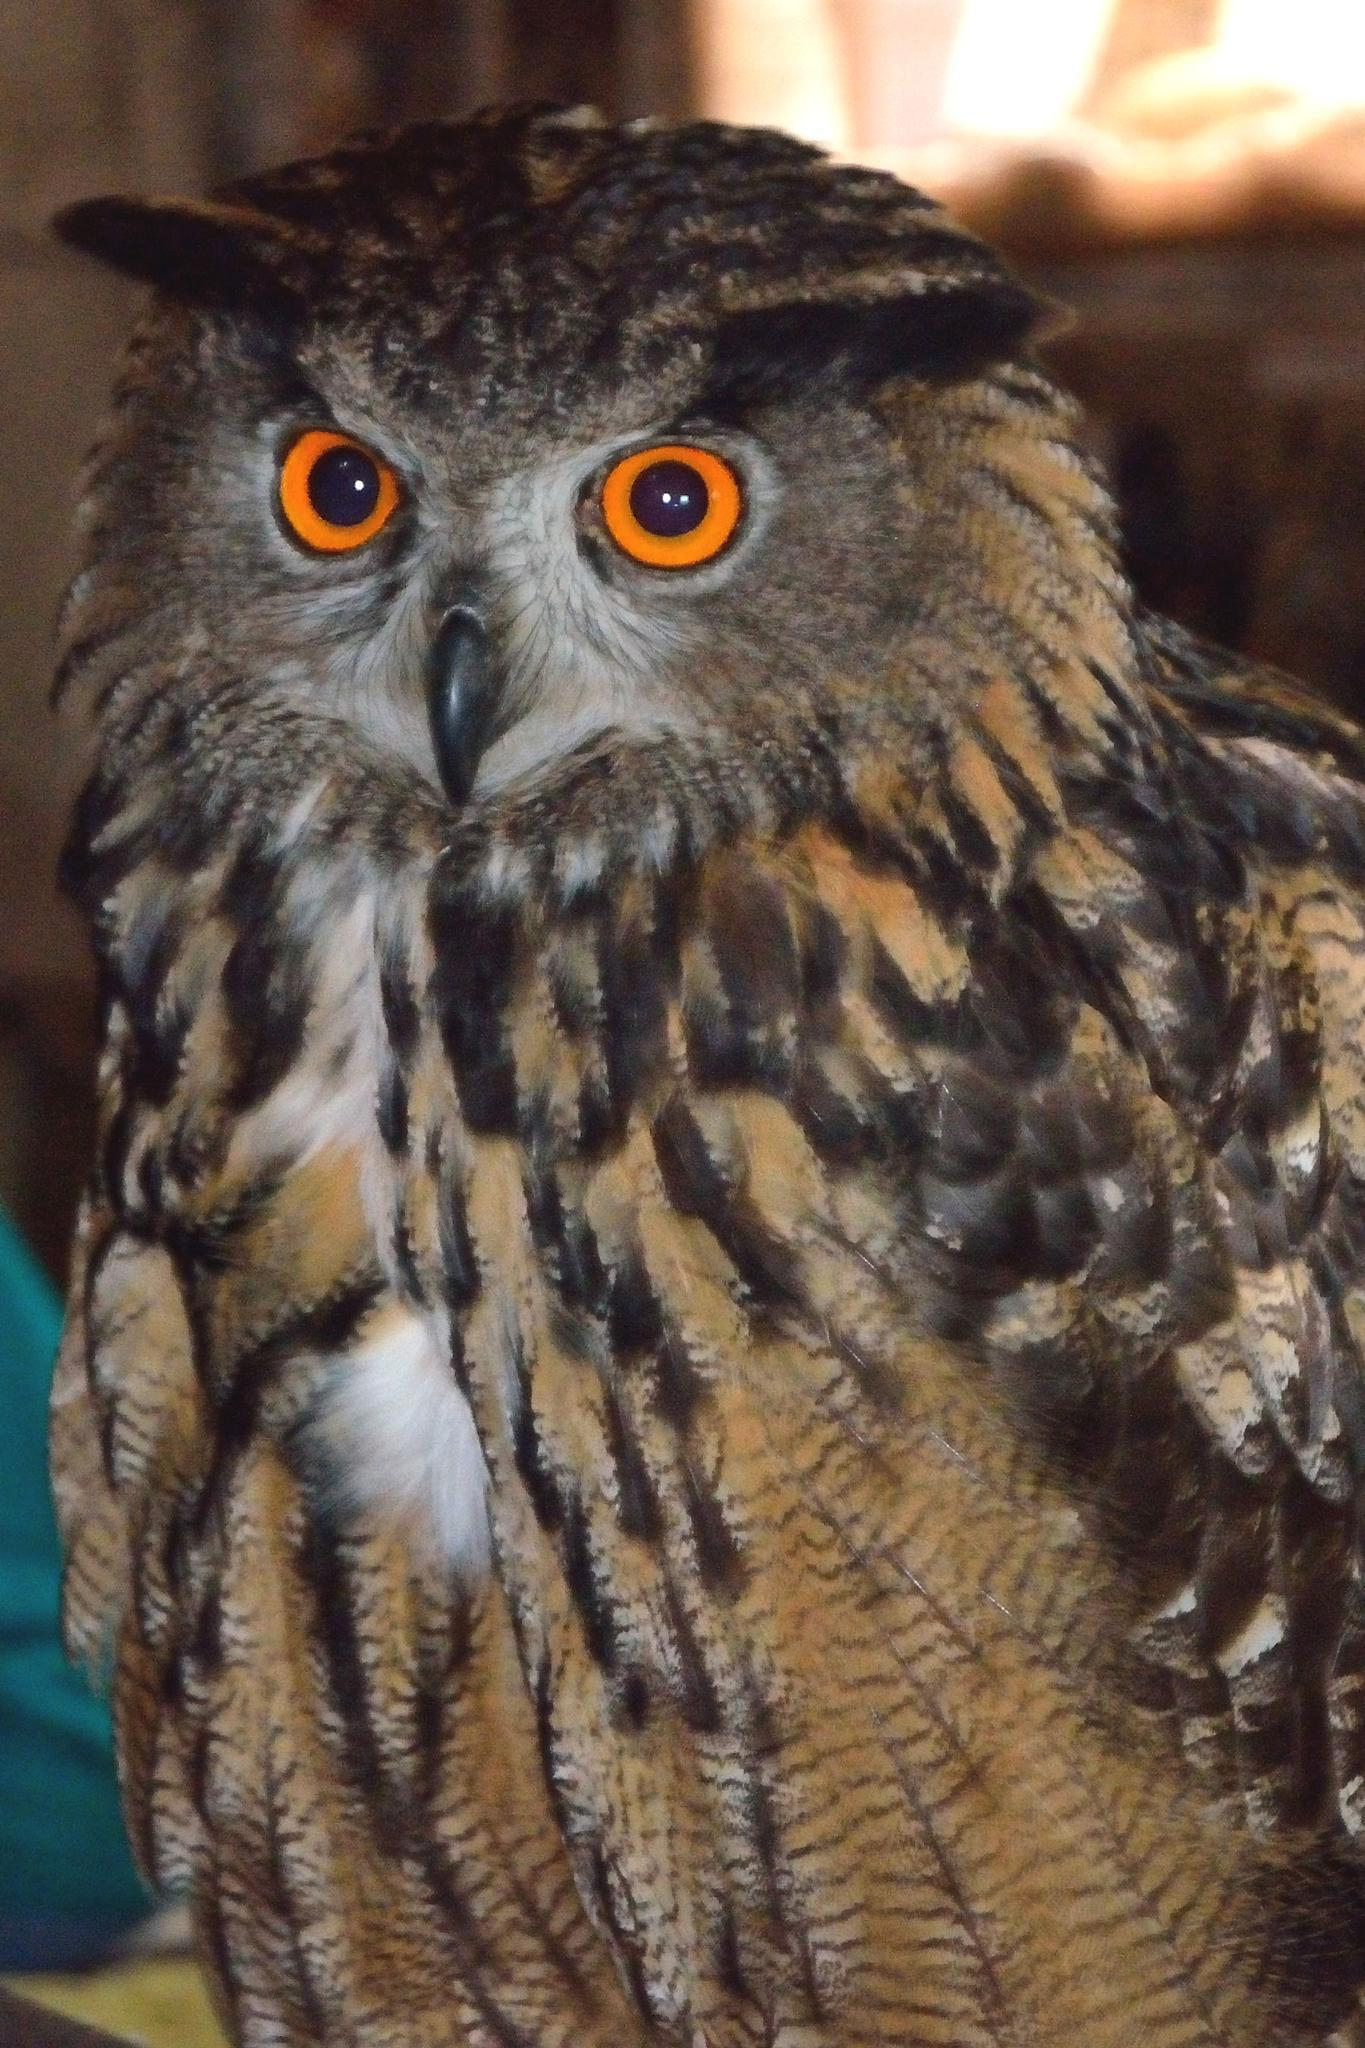 Europese Oehoe / European Eagle Owl by Henk Meima